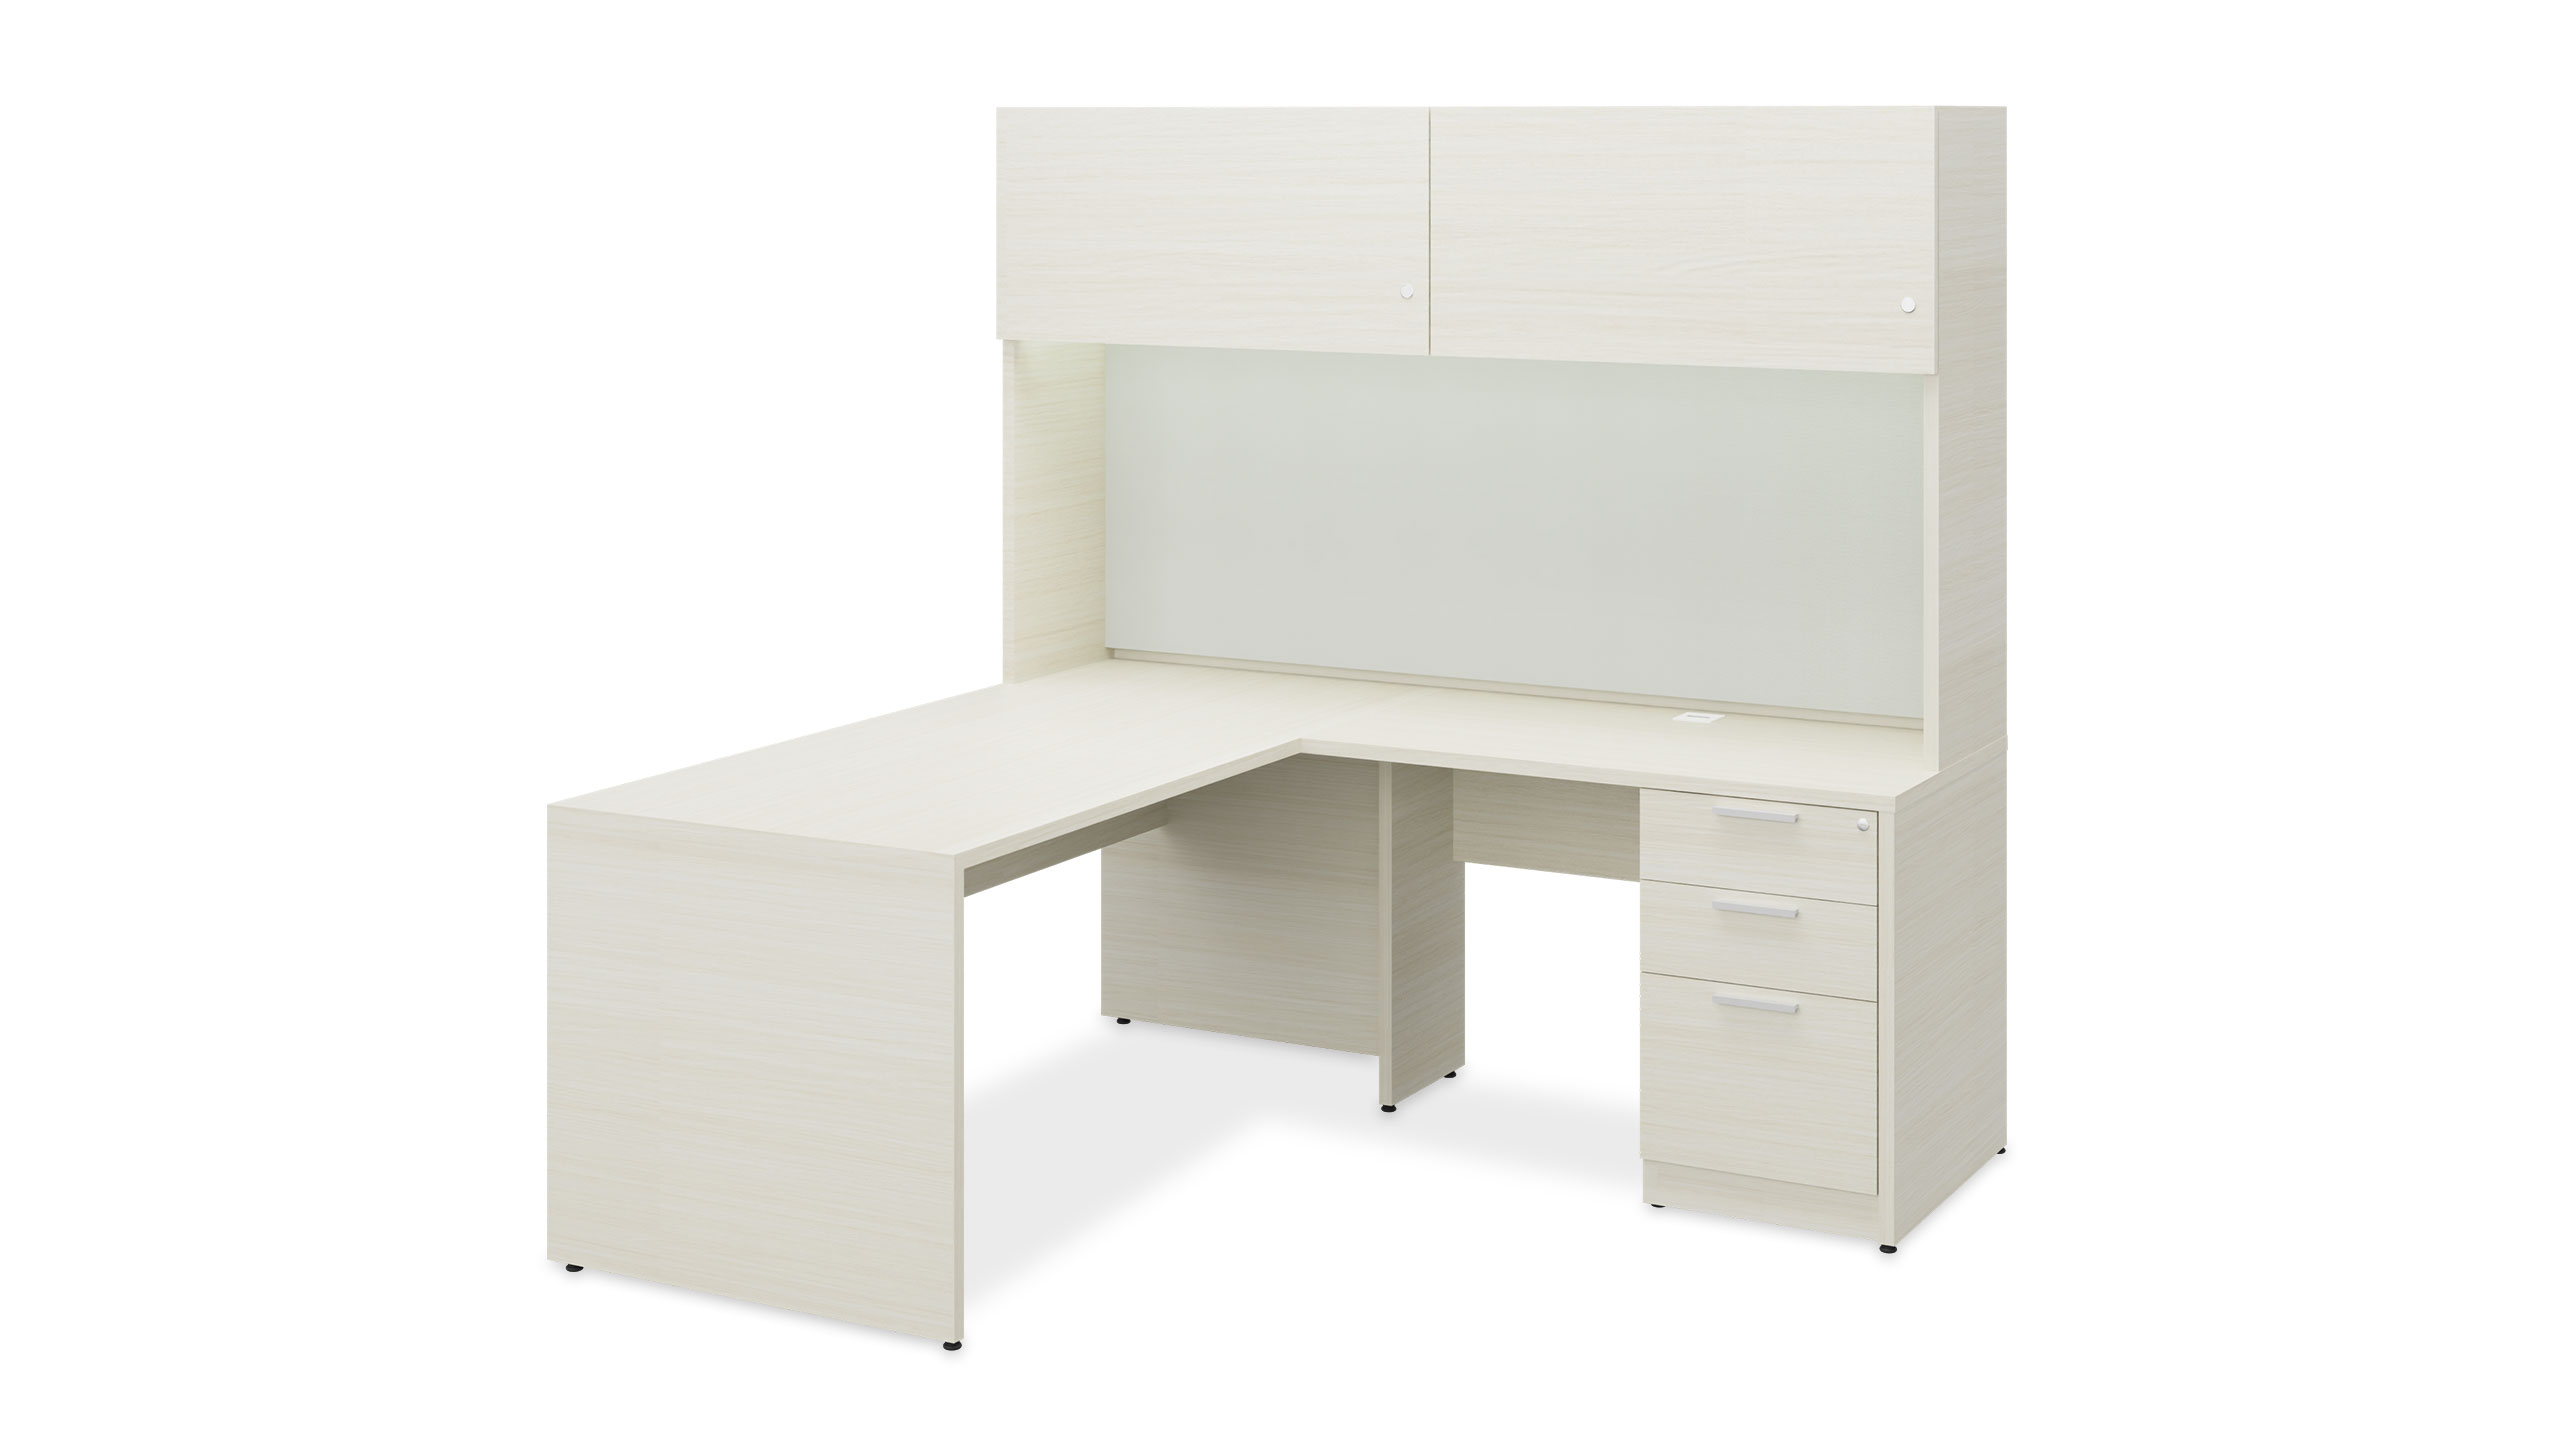 Hutch L-Desk 2905 on a white background